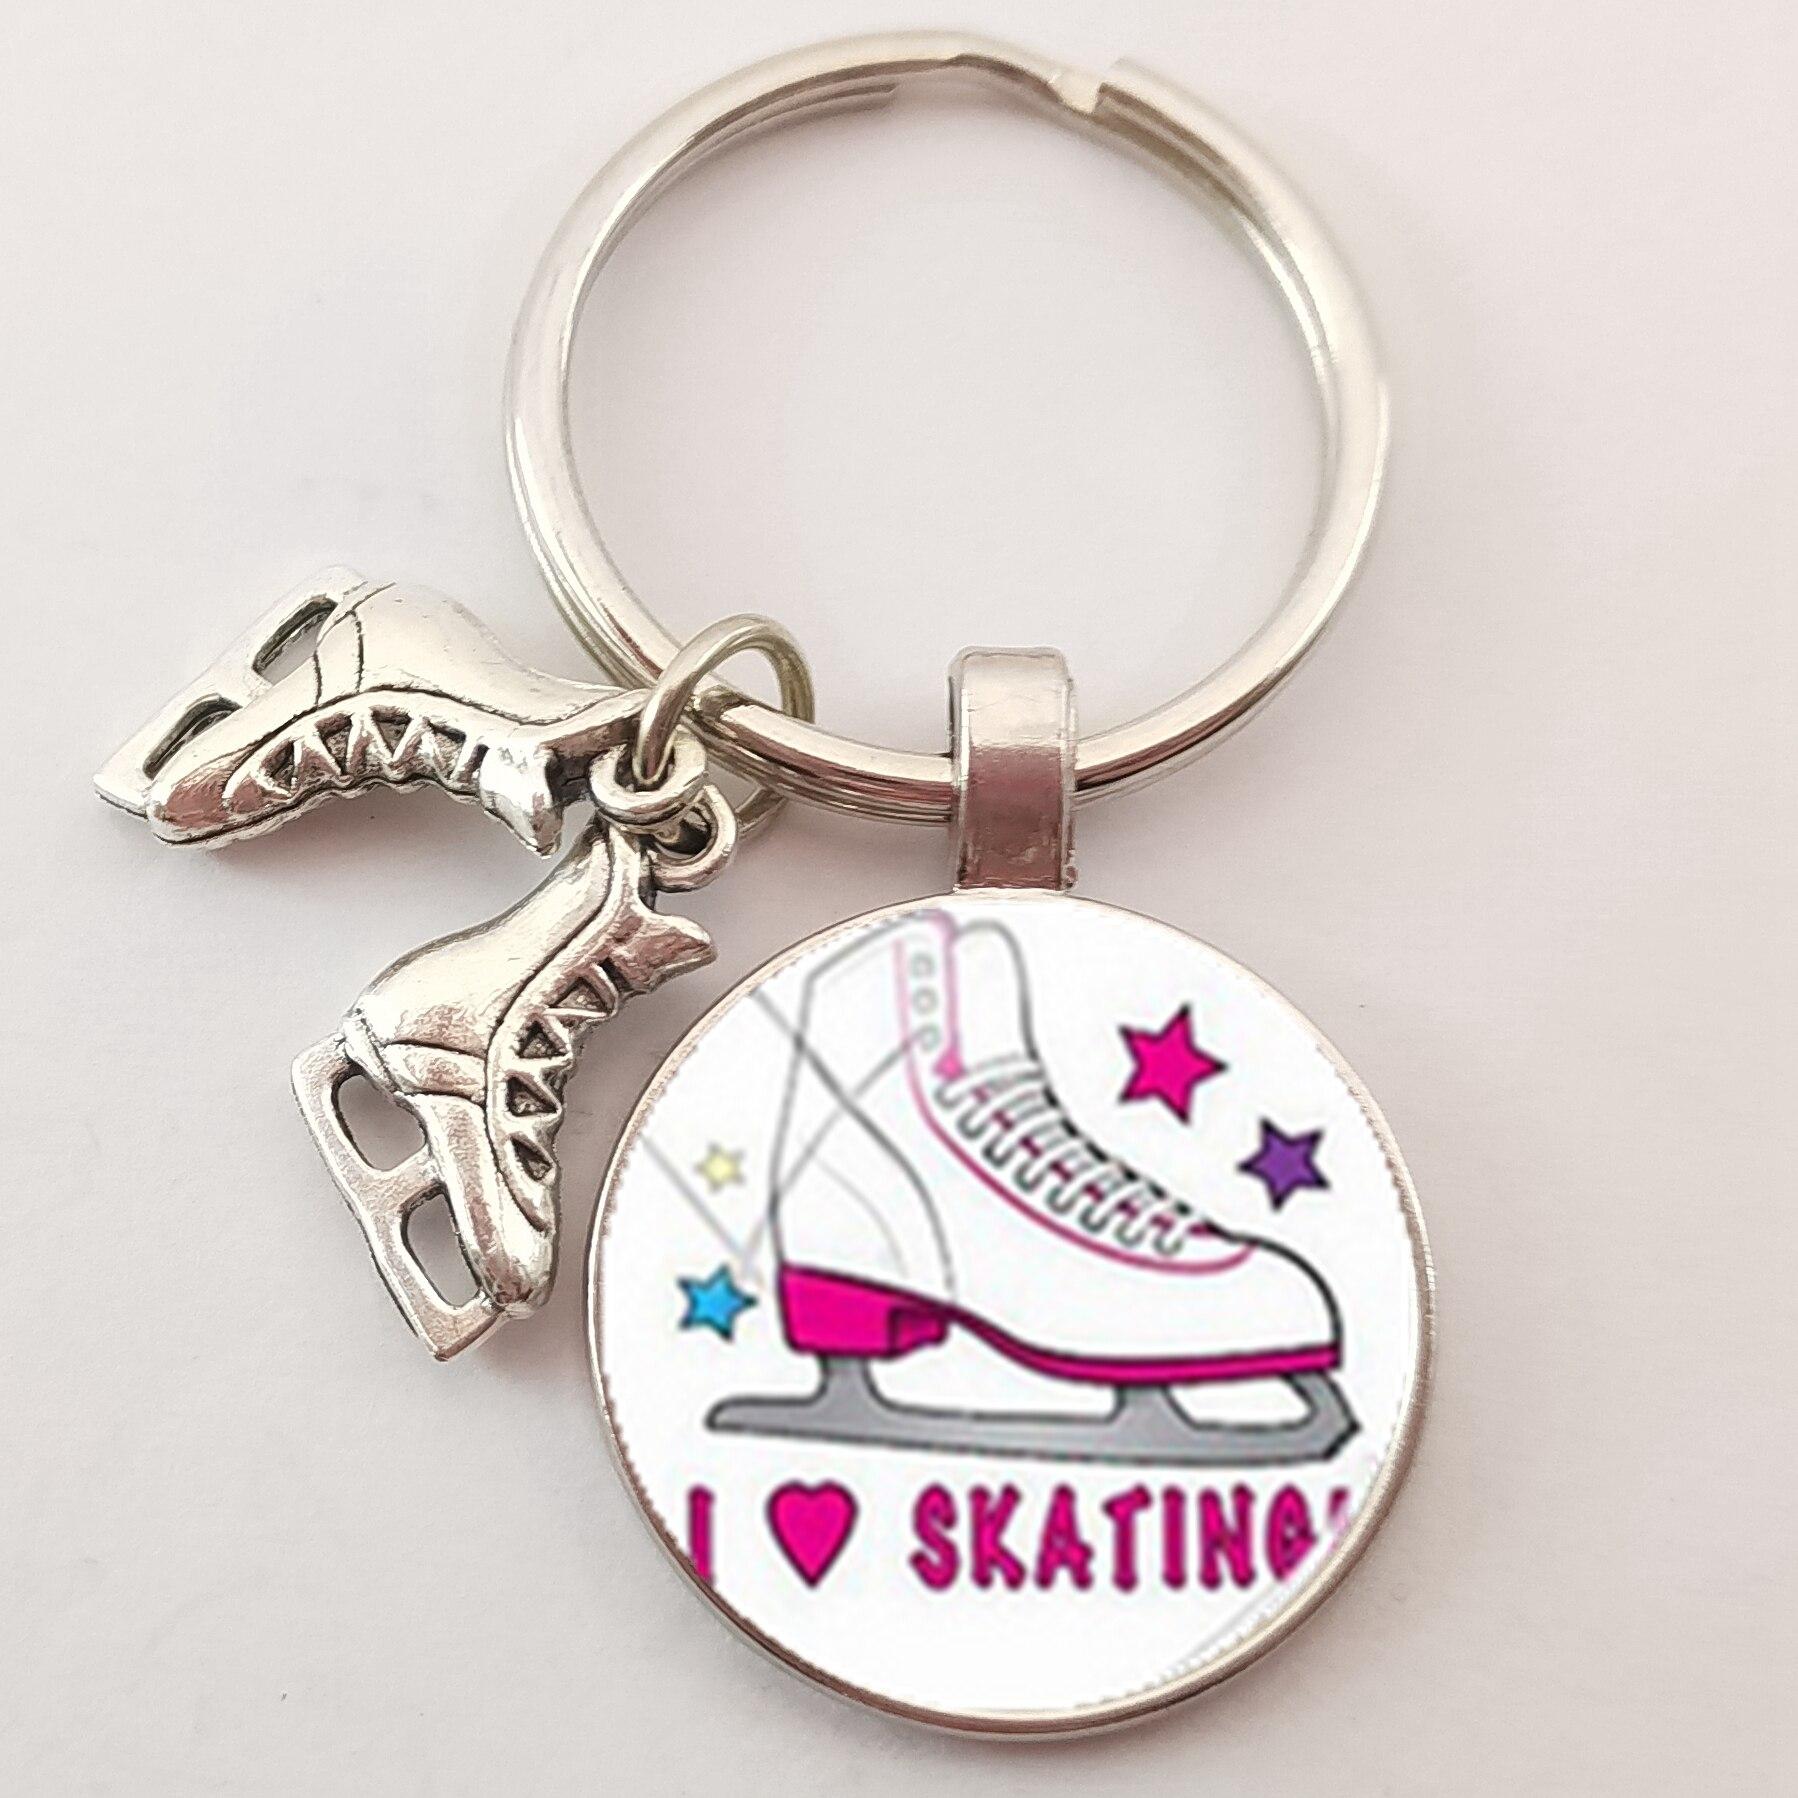 Pair of Roller Skate Boots Keyring Skating Souvenir Skates Gift Key Ring